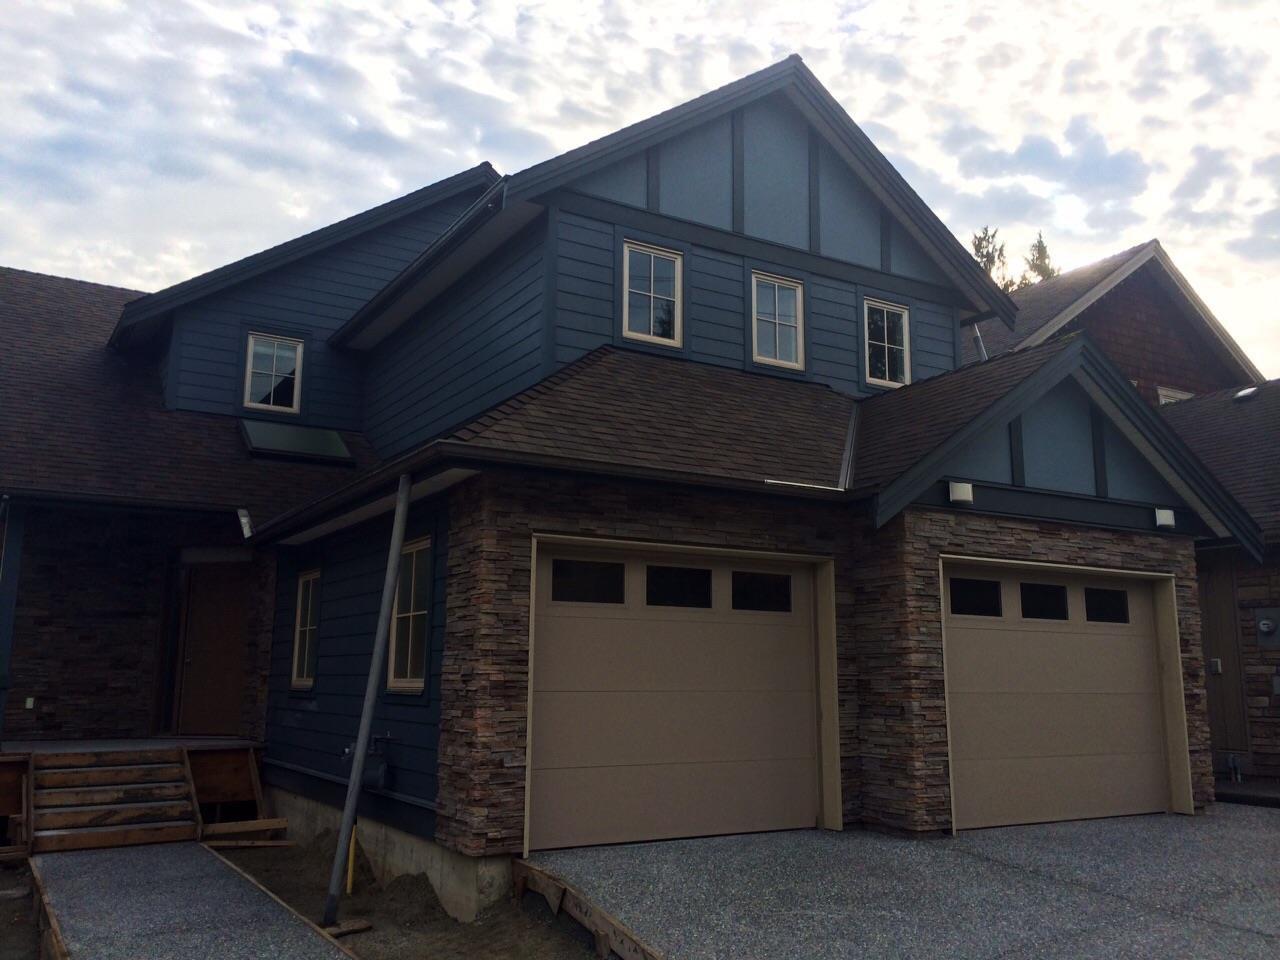 "Photo 2: Photos: 9556 204 Street in Langley: Walnut Grove House for sale in ""Walnut Grove"" : MLS®# R2008701"